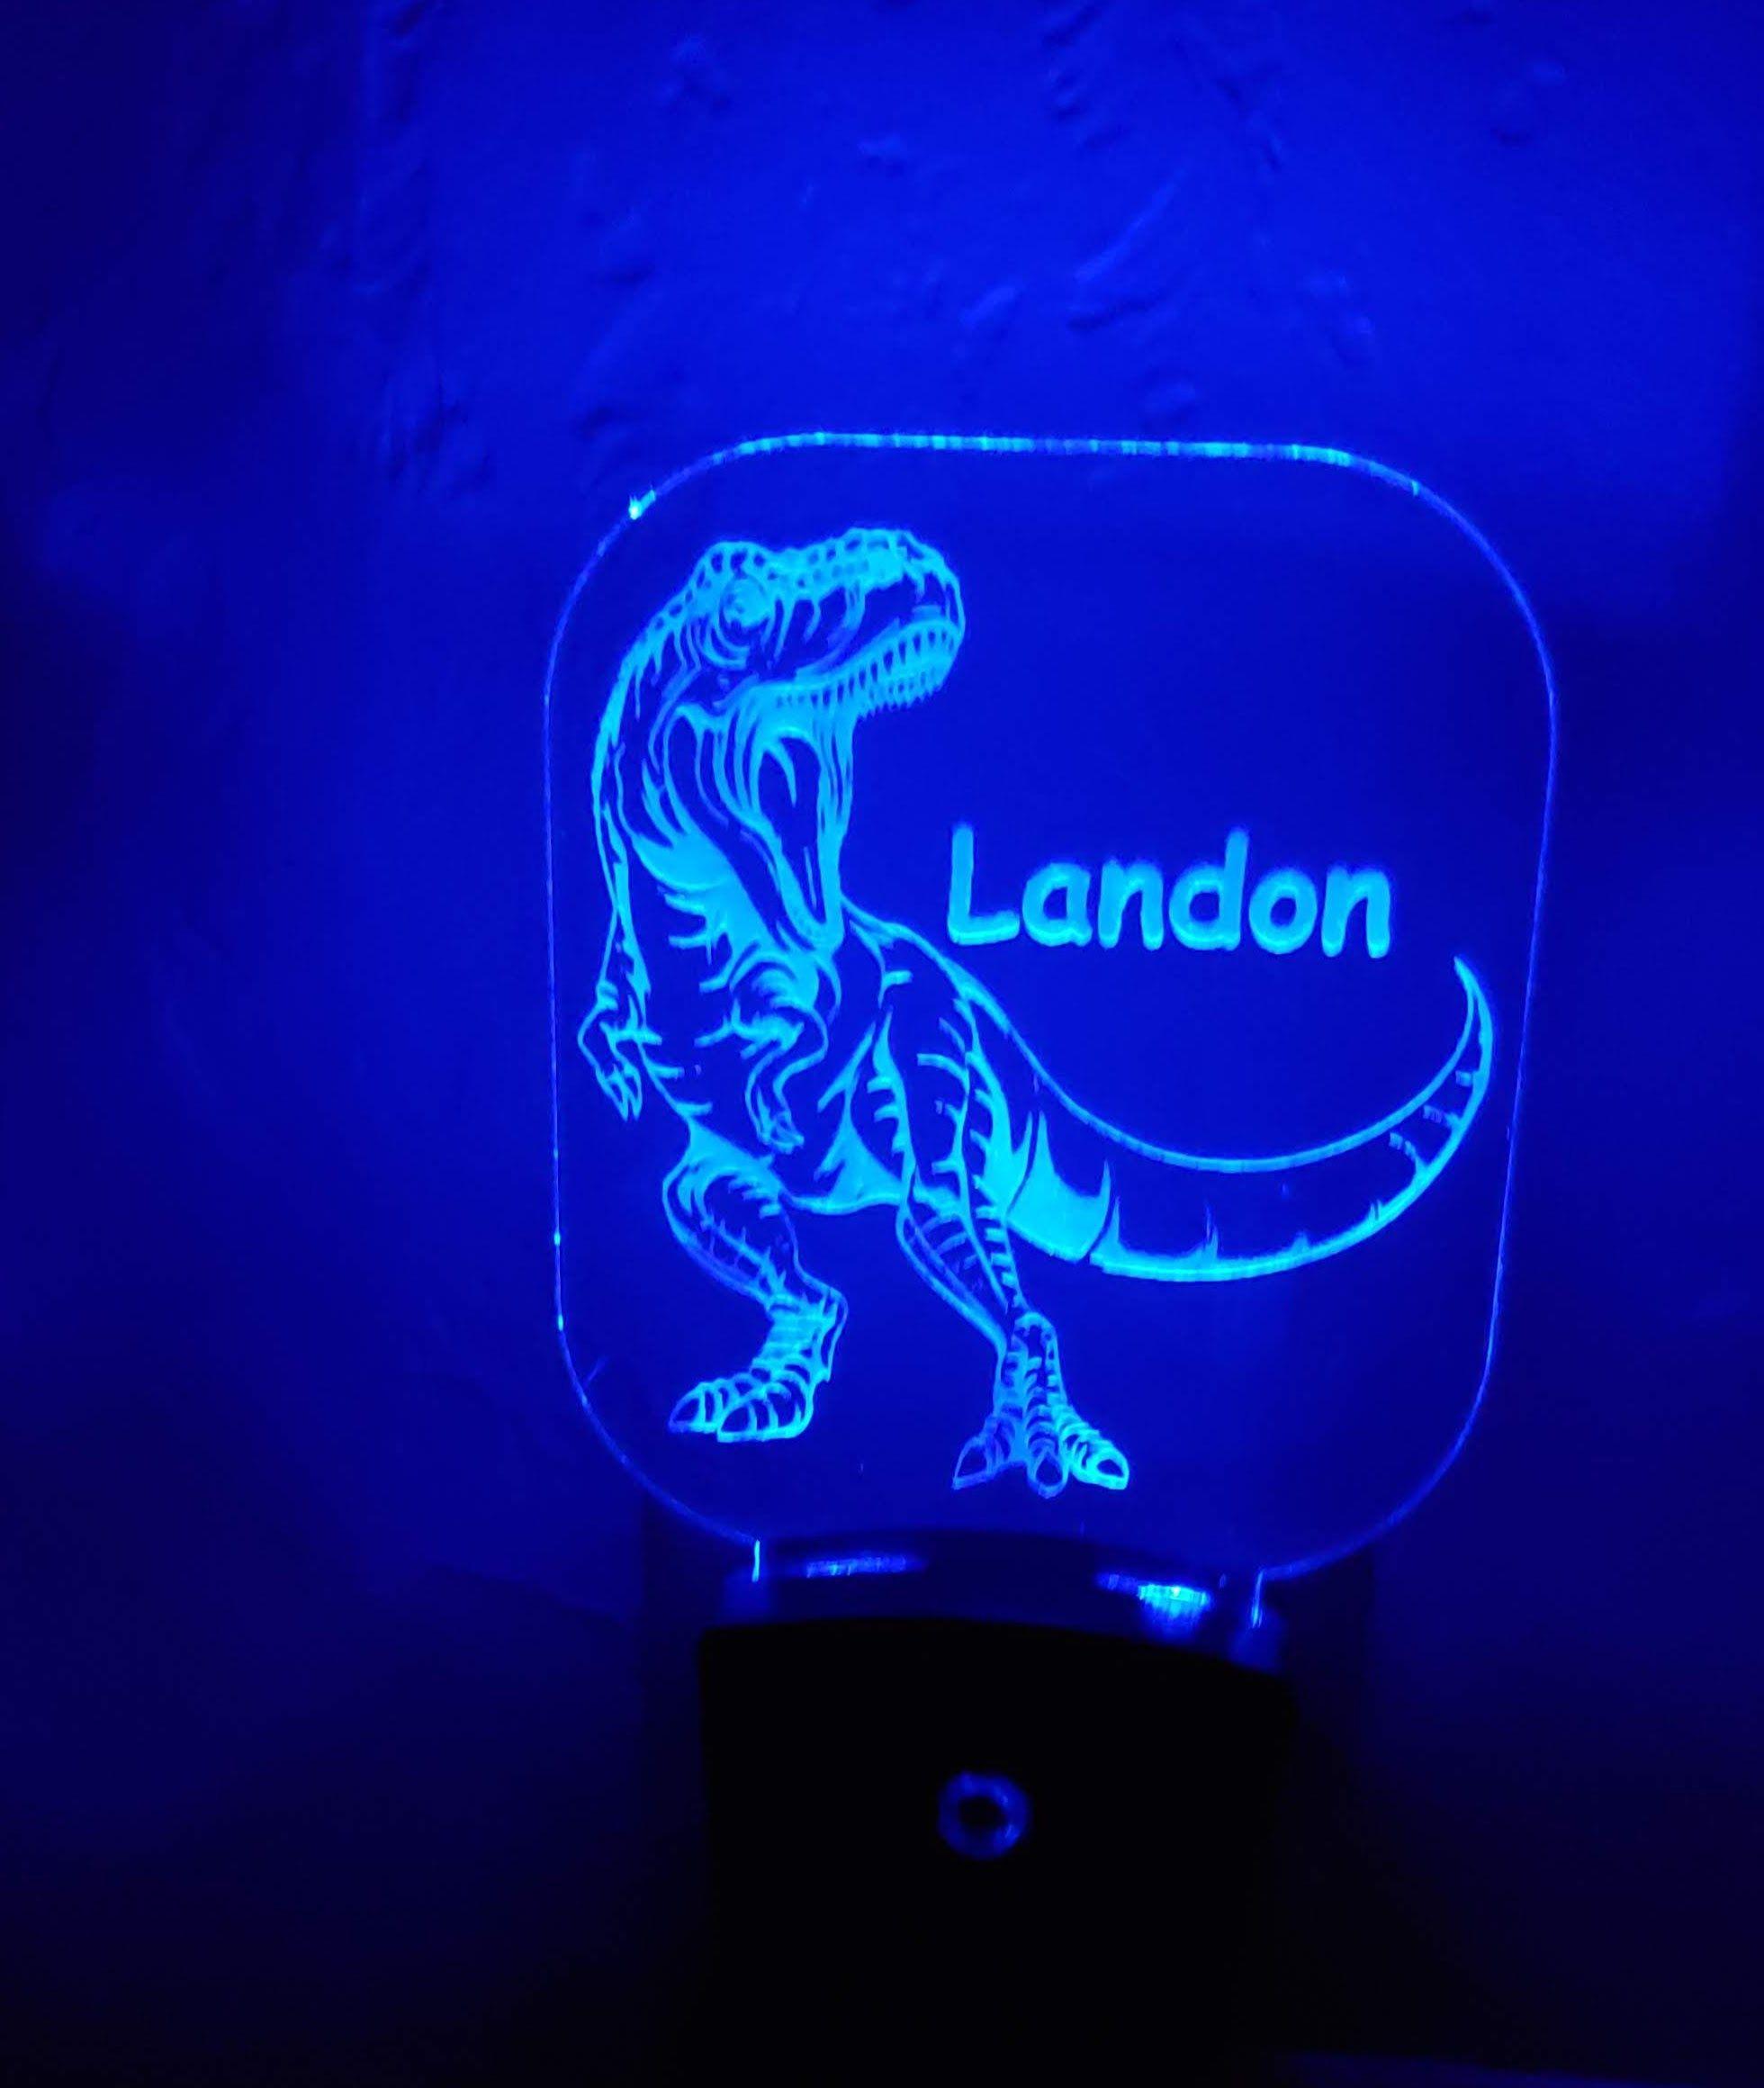 Night Light Personalized TRex, TRex nightlight